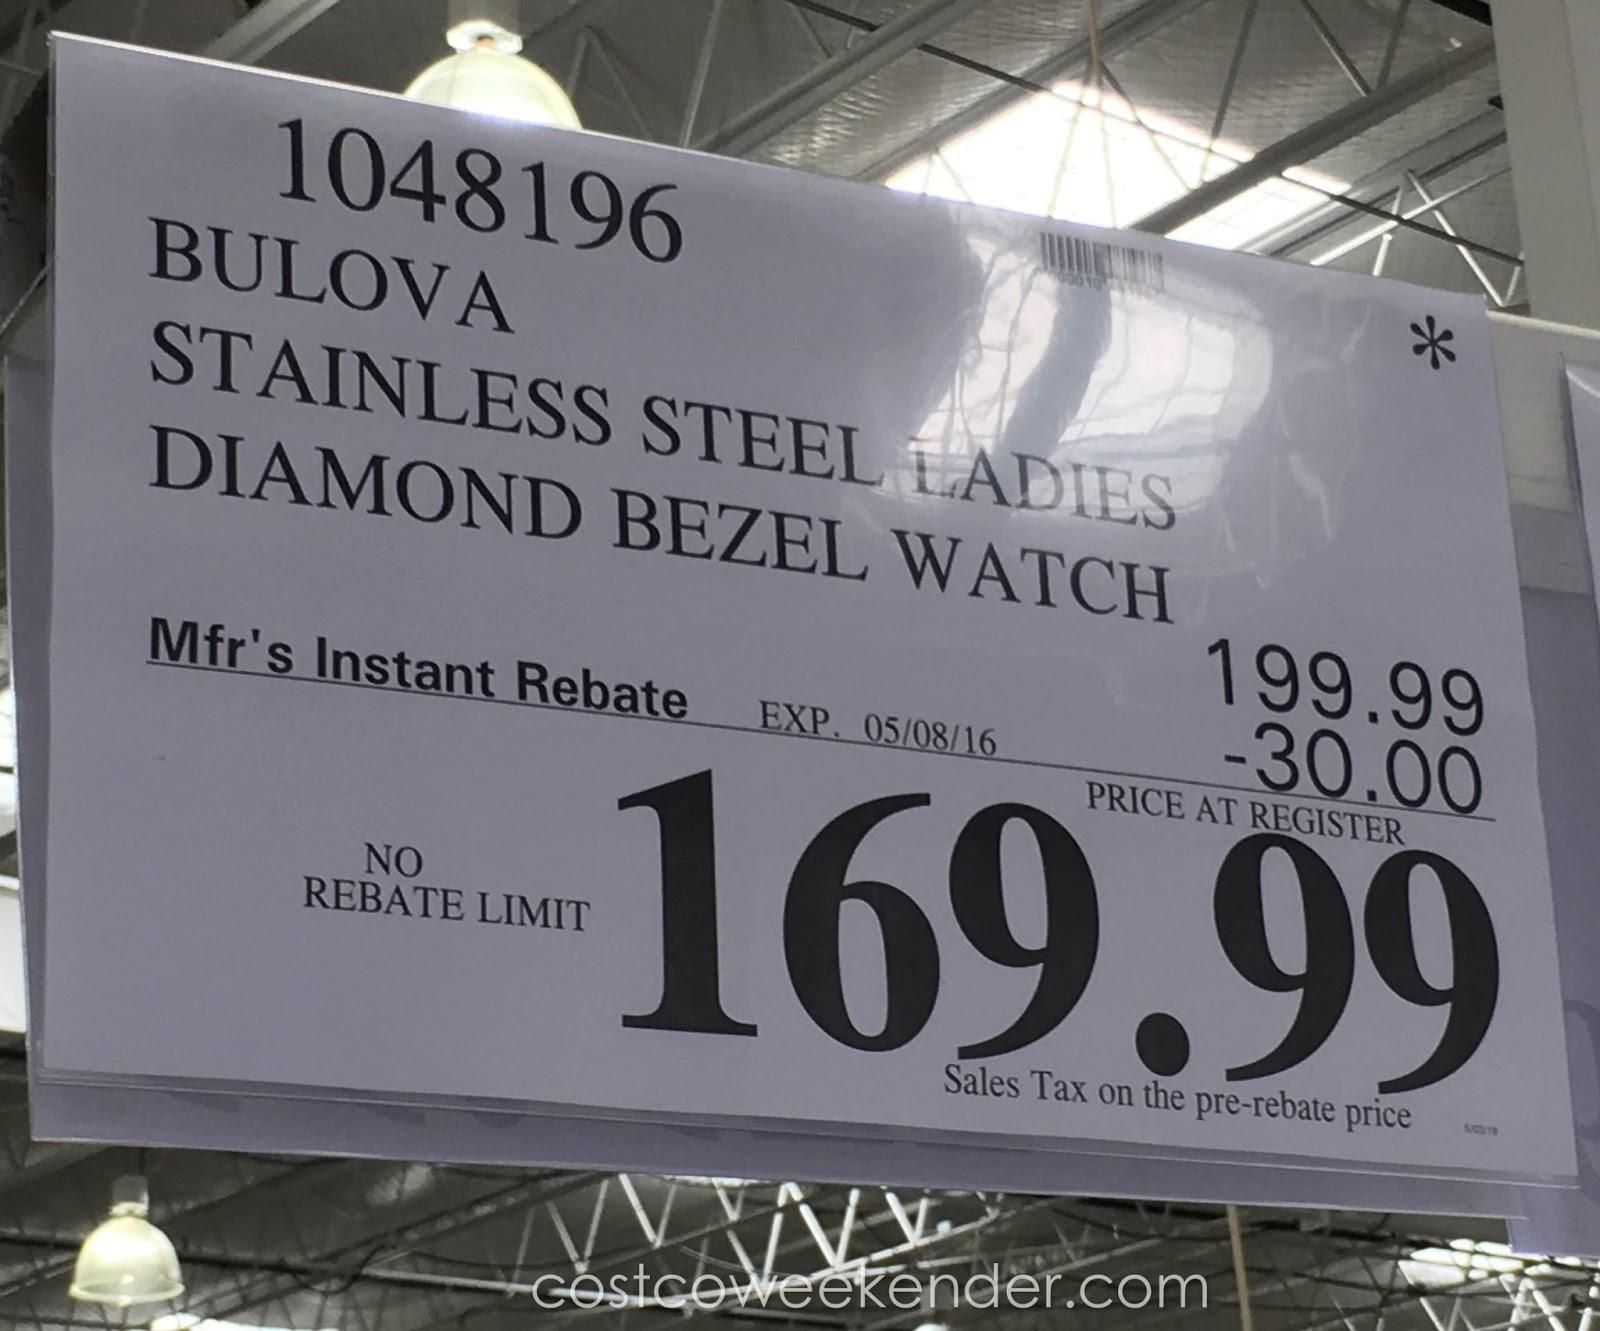 Bulova Diamonds Stainless Steel Ladies Bezel Watch Costco Weekender